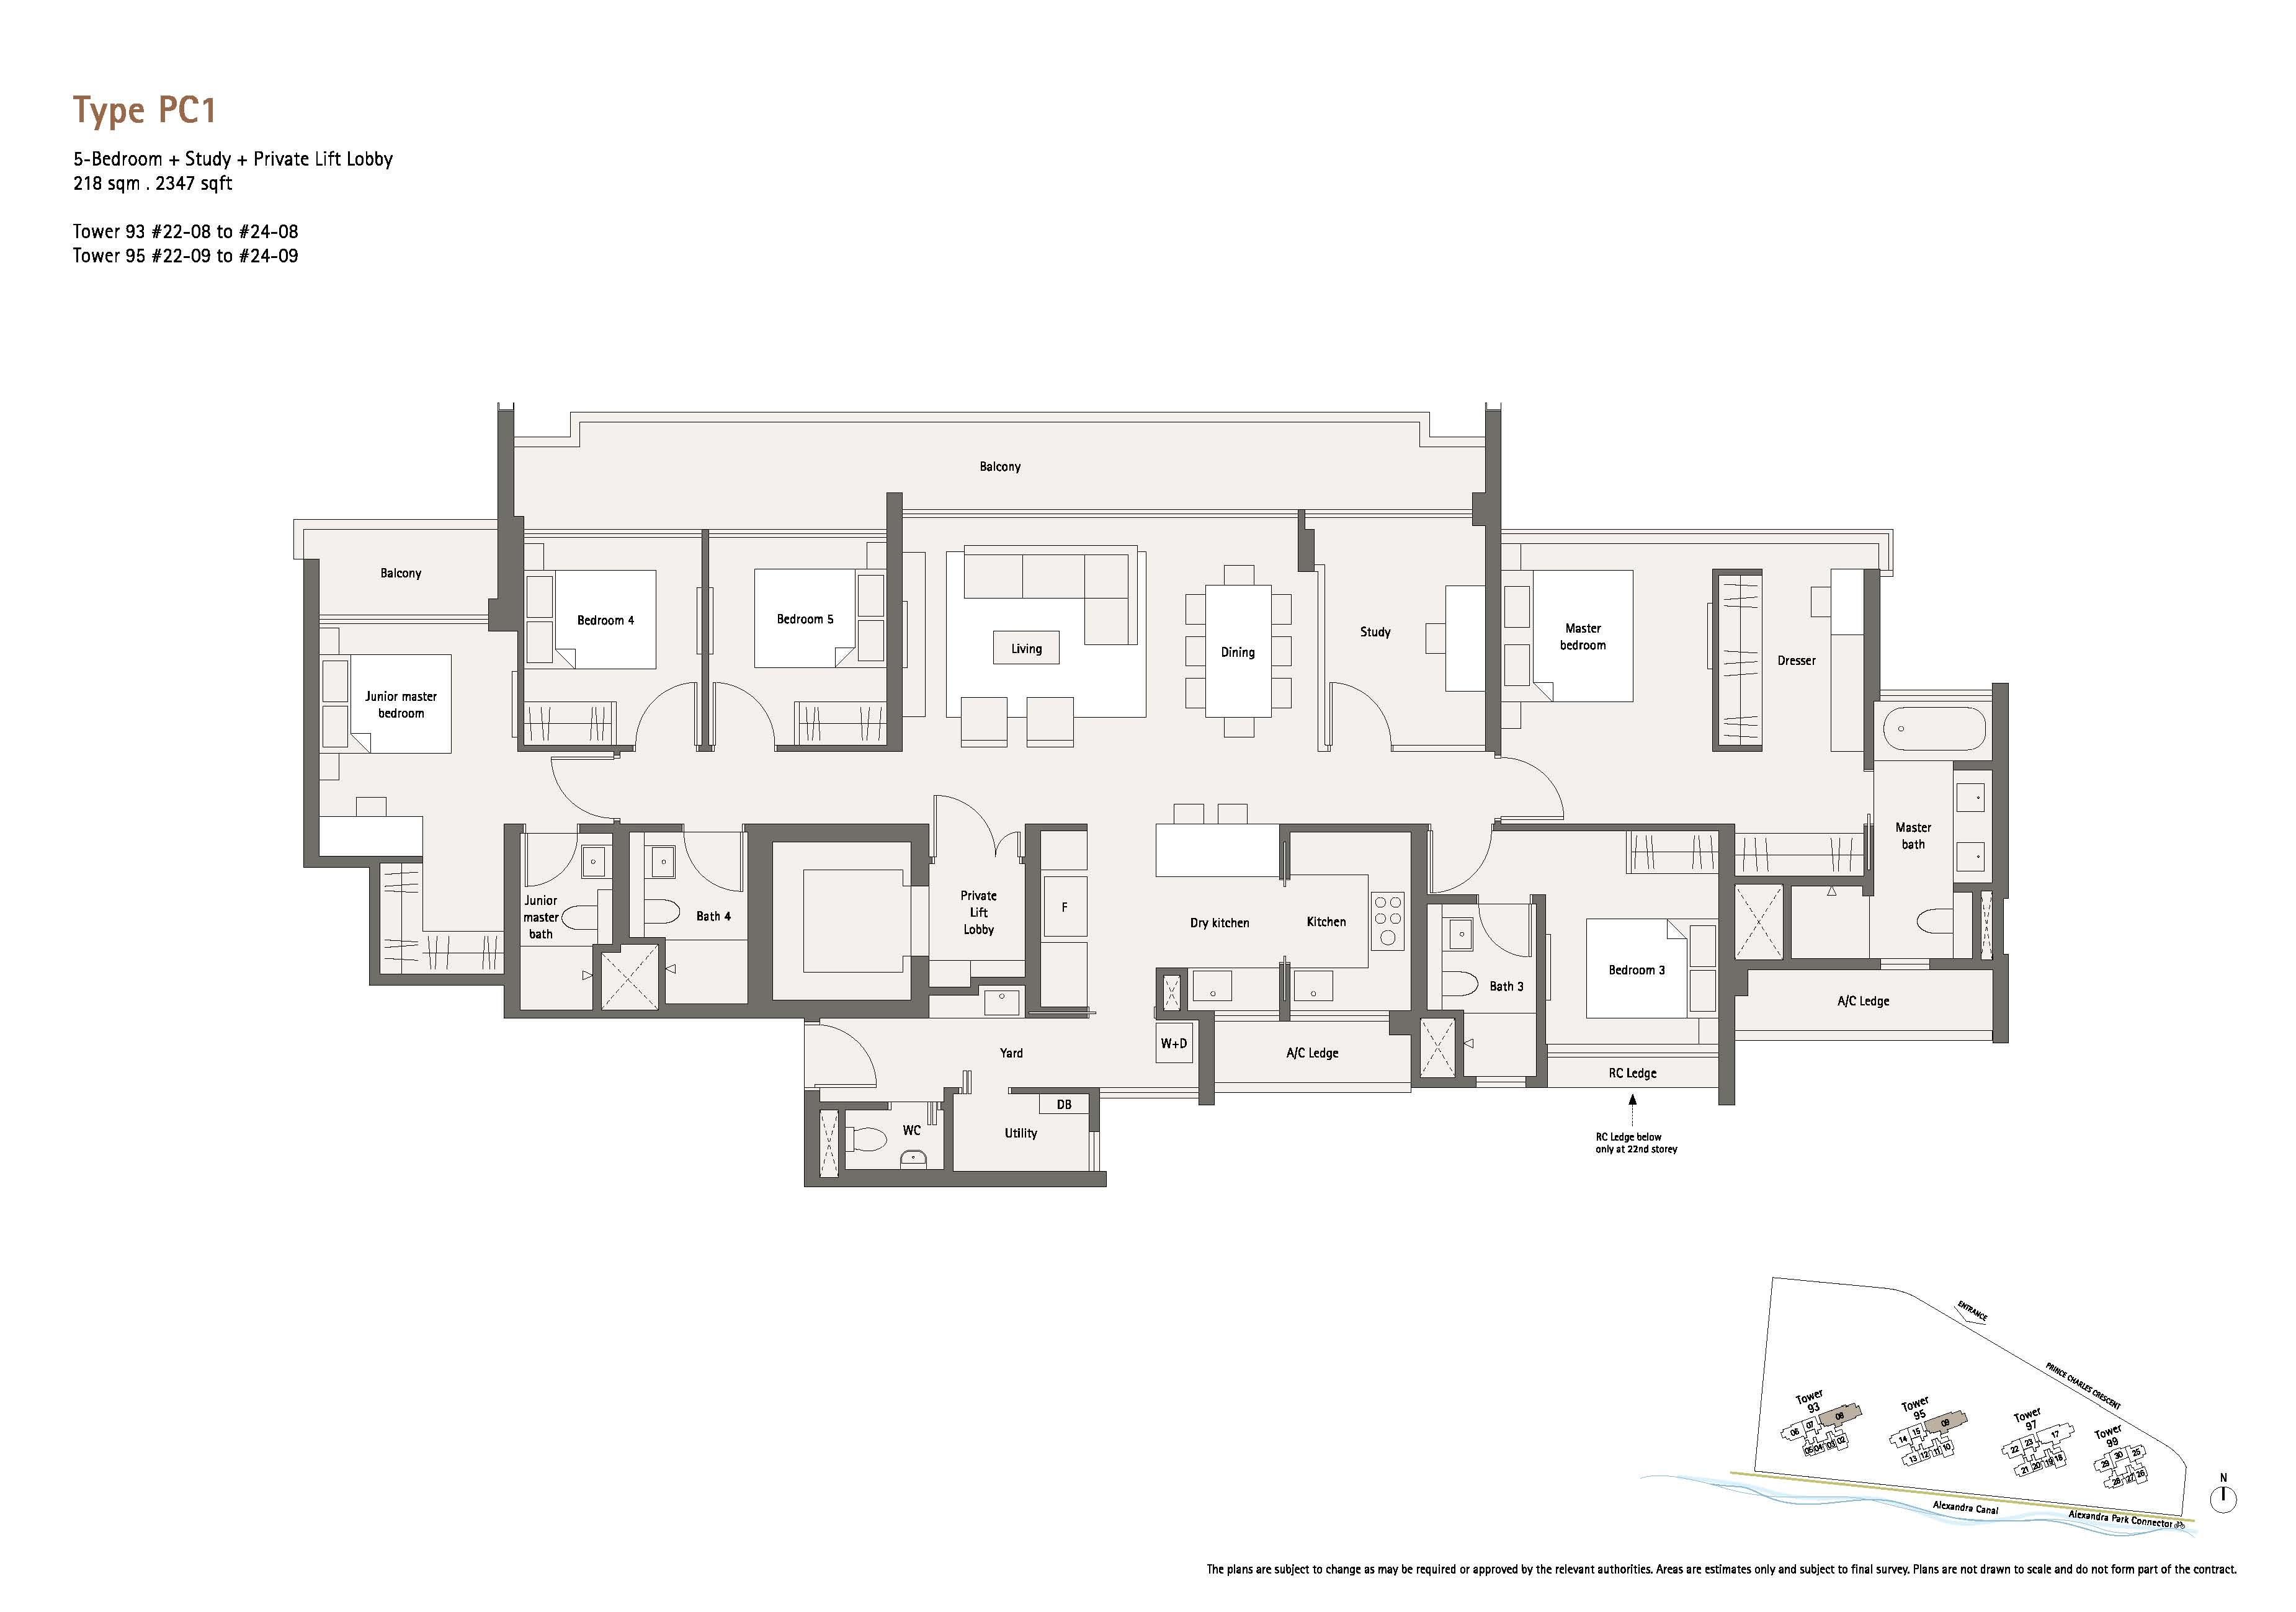 Penthouse 5 Bedrm +Study +Pte Lift